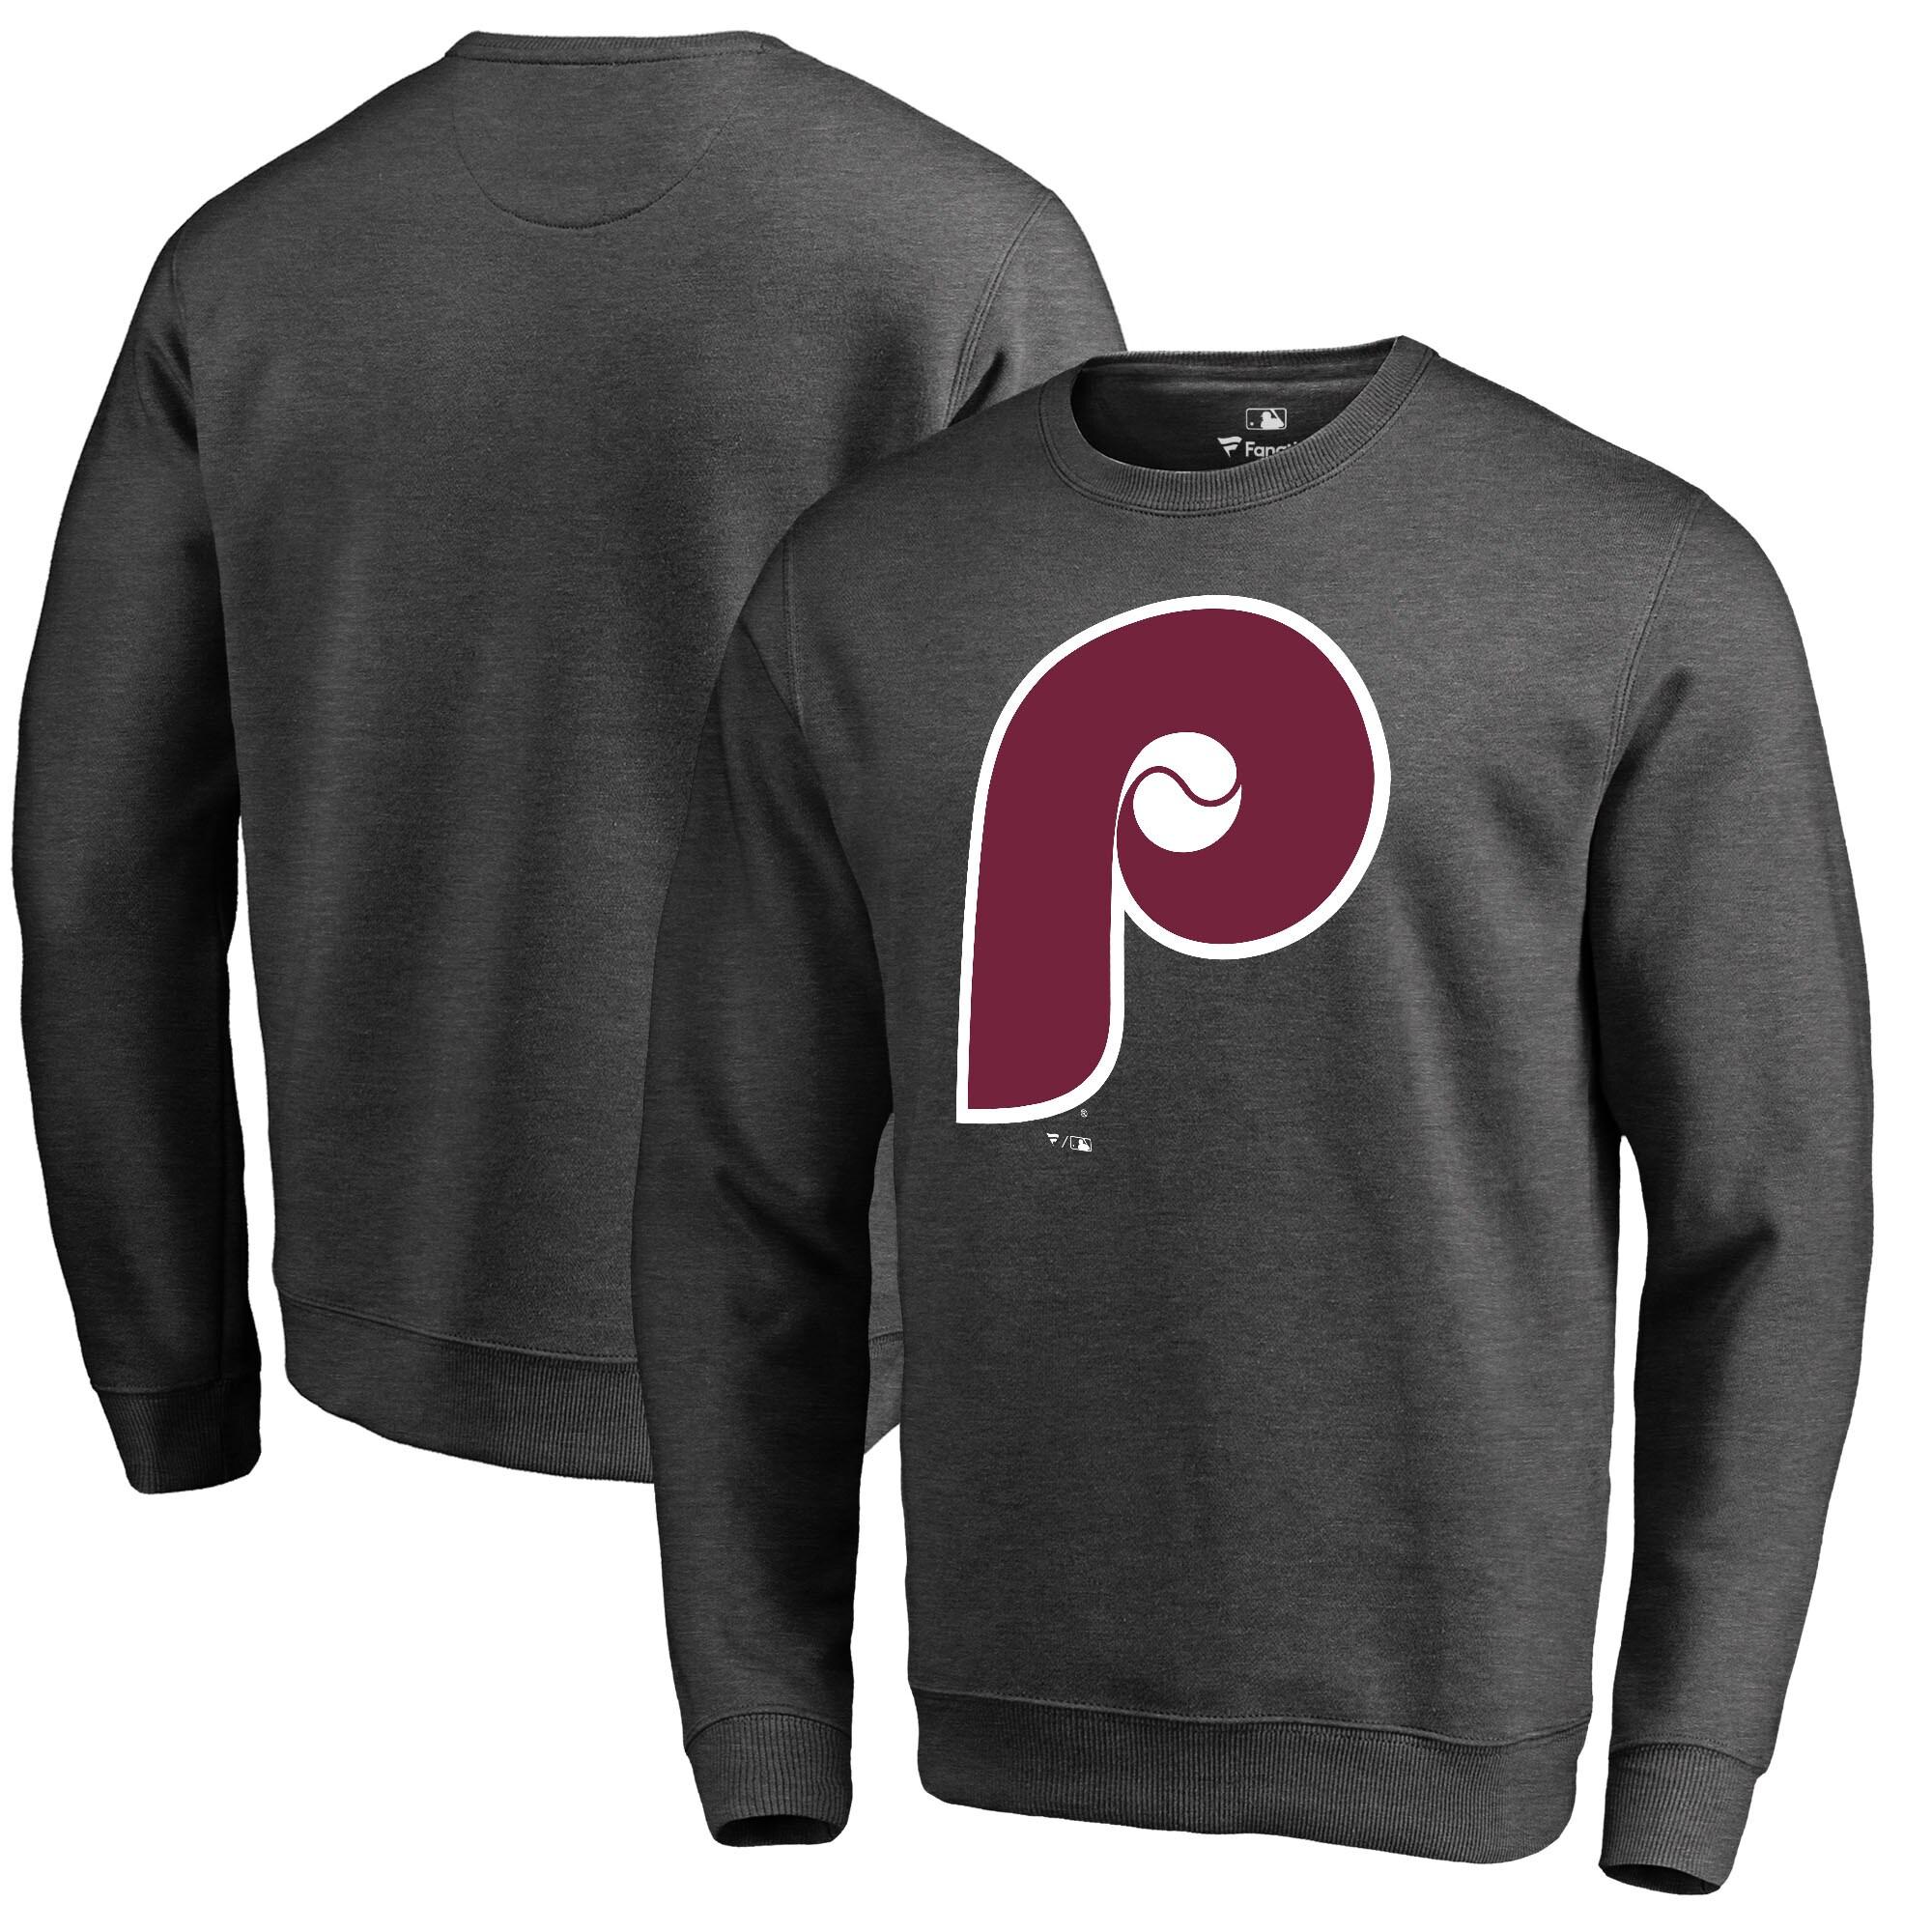 Philadelphia Phillies Fanatics Branded Cooperstown Collection Huntington Sweatshirt - Heathered Gray